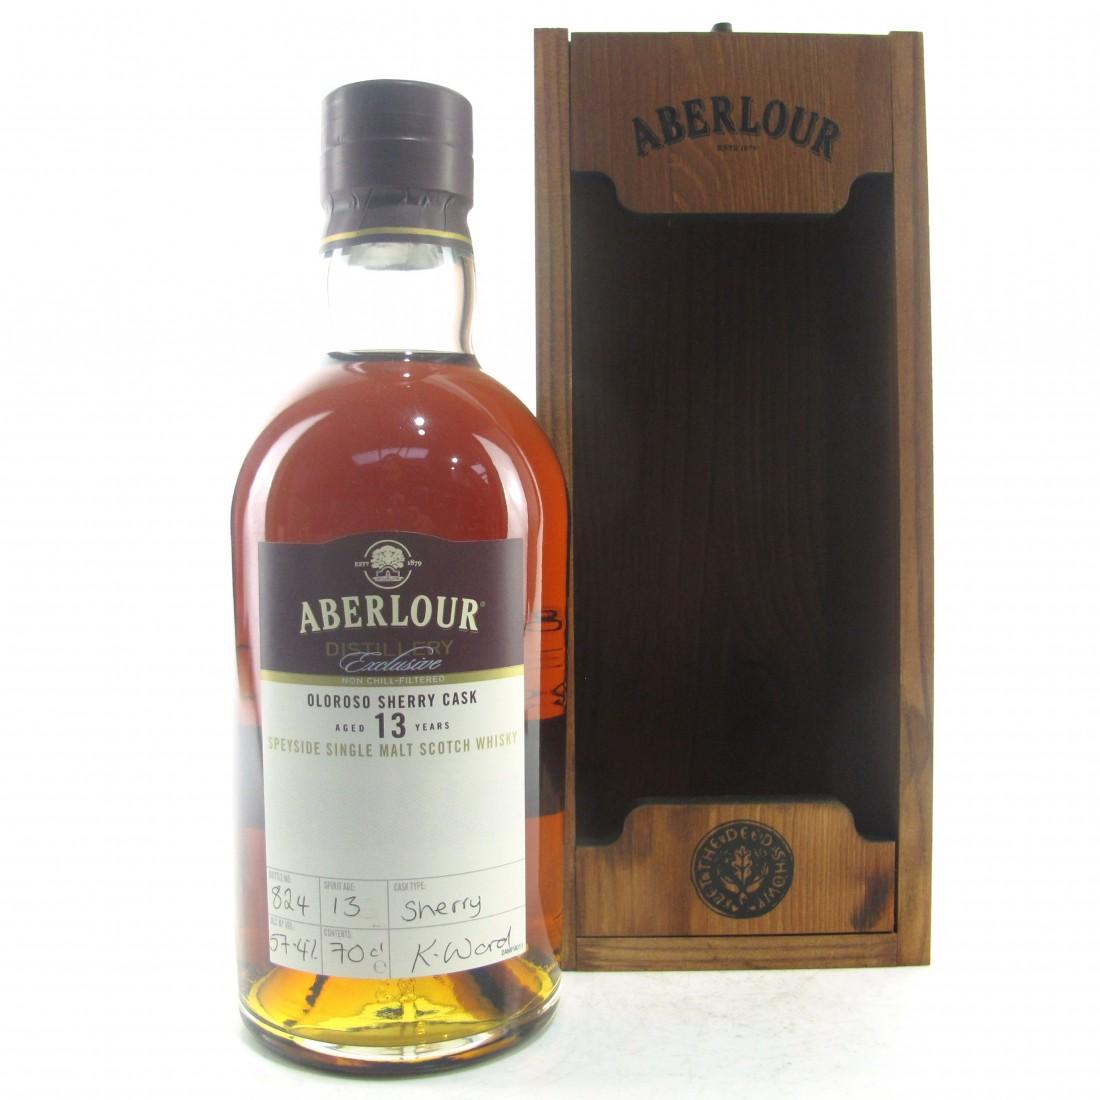 Aberlour 13 Year Old Distillery Exclusive / Oloroso Cask